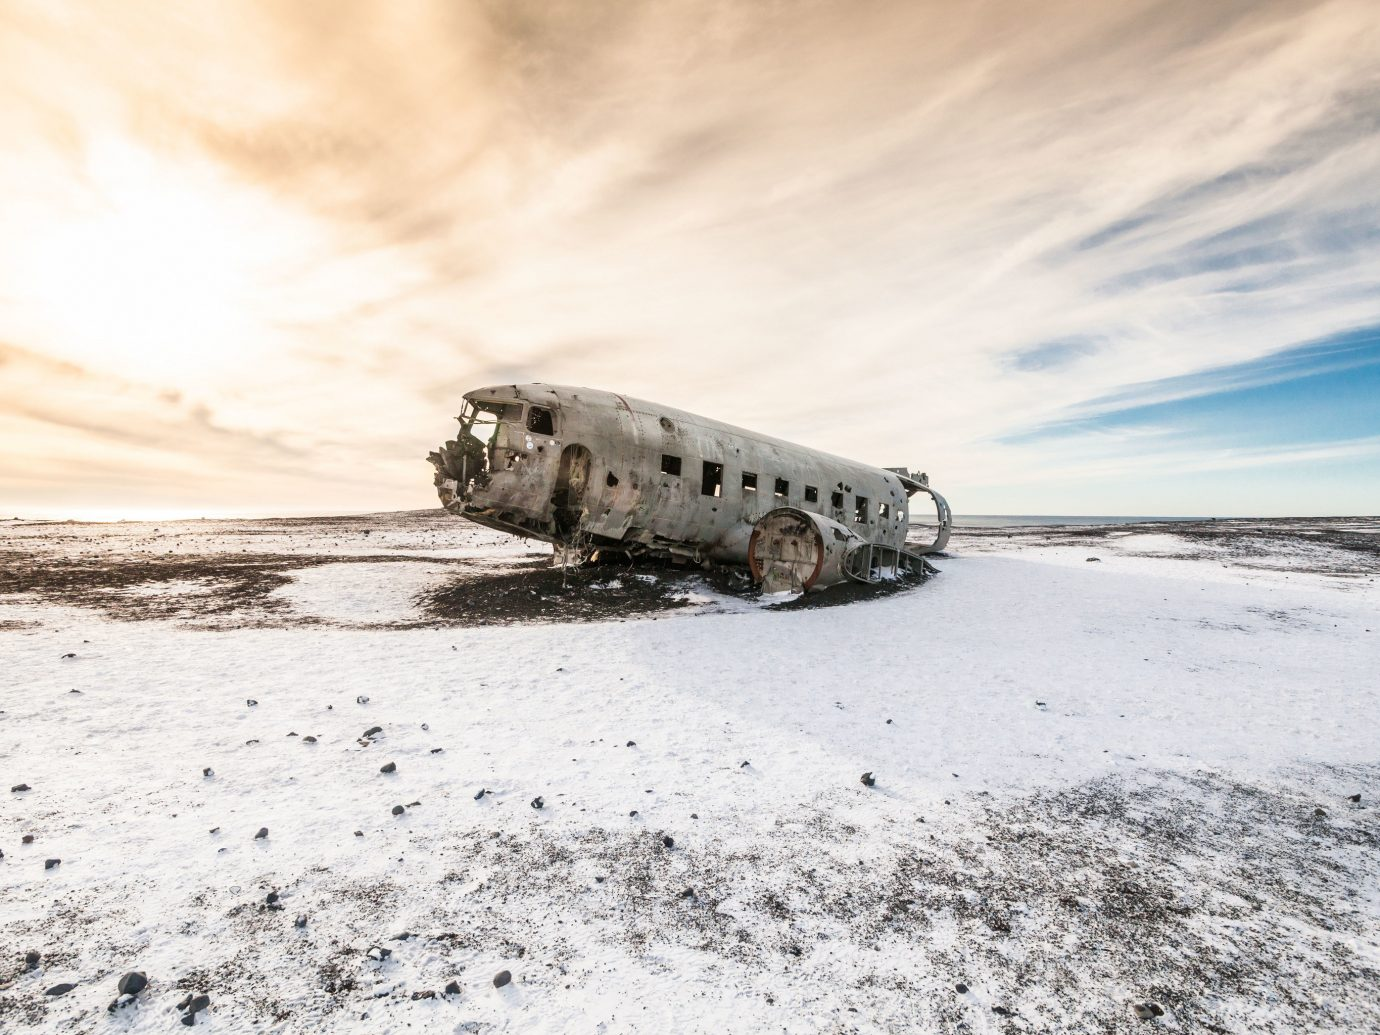 Iceland Outdoors + Adventure Road Trips sky cloud snow water Sea landscape sand ice freezing tundra ecoregion vehicle Winter arctic